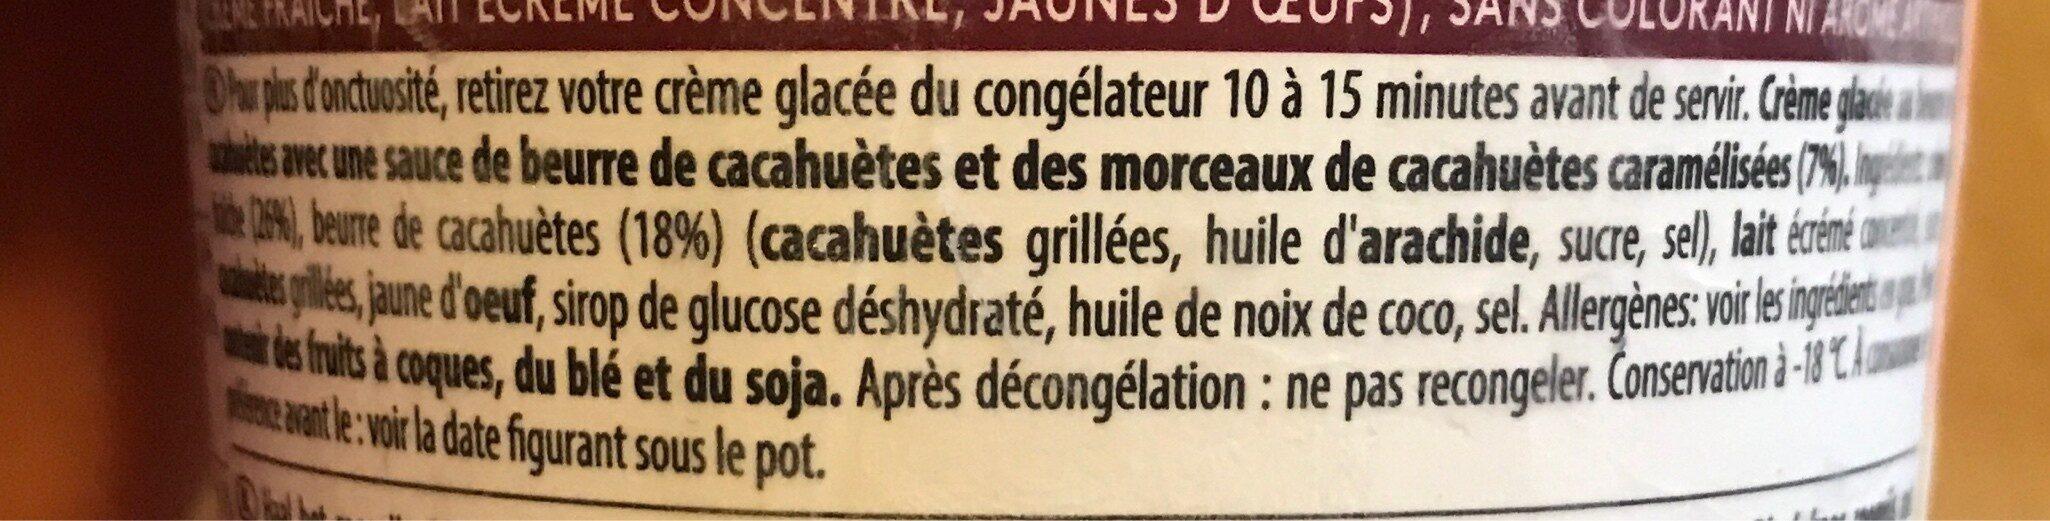 Peanut butter crunch - Ingrédients - fr